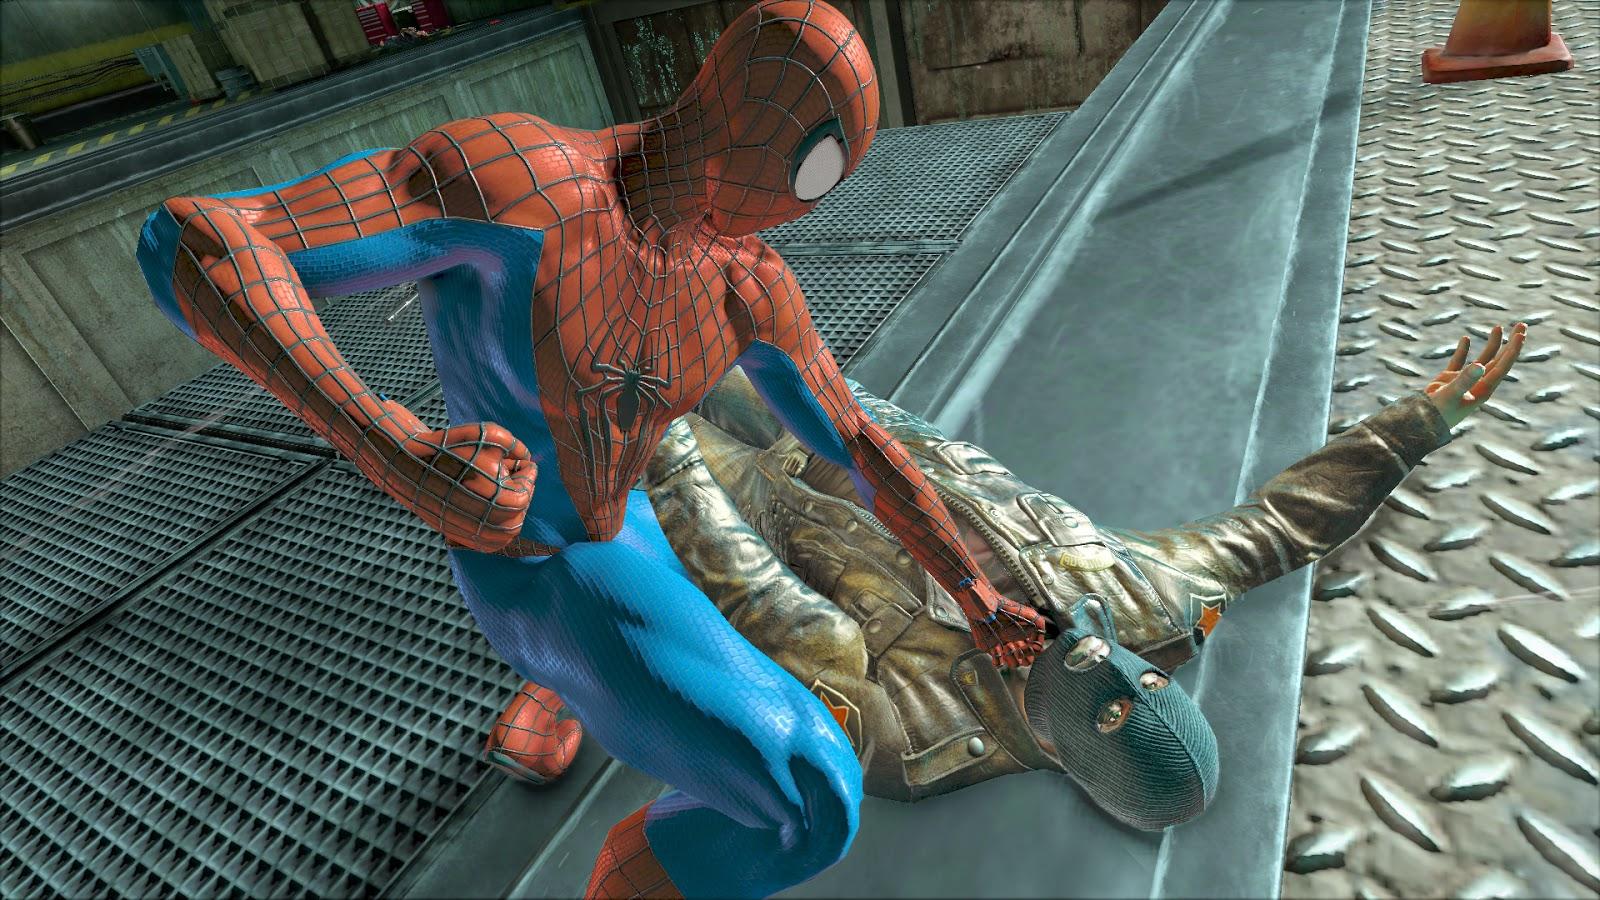 P Spiderman Games The Amazing Spider man 2